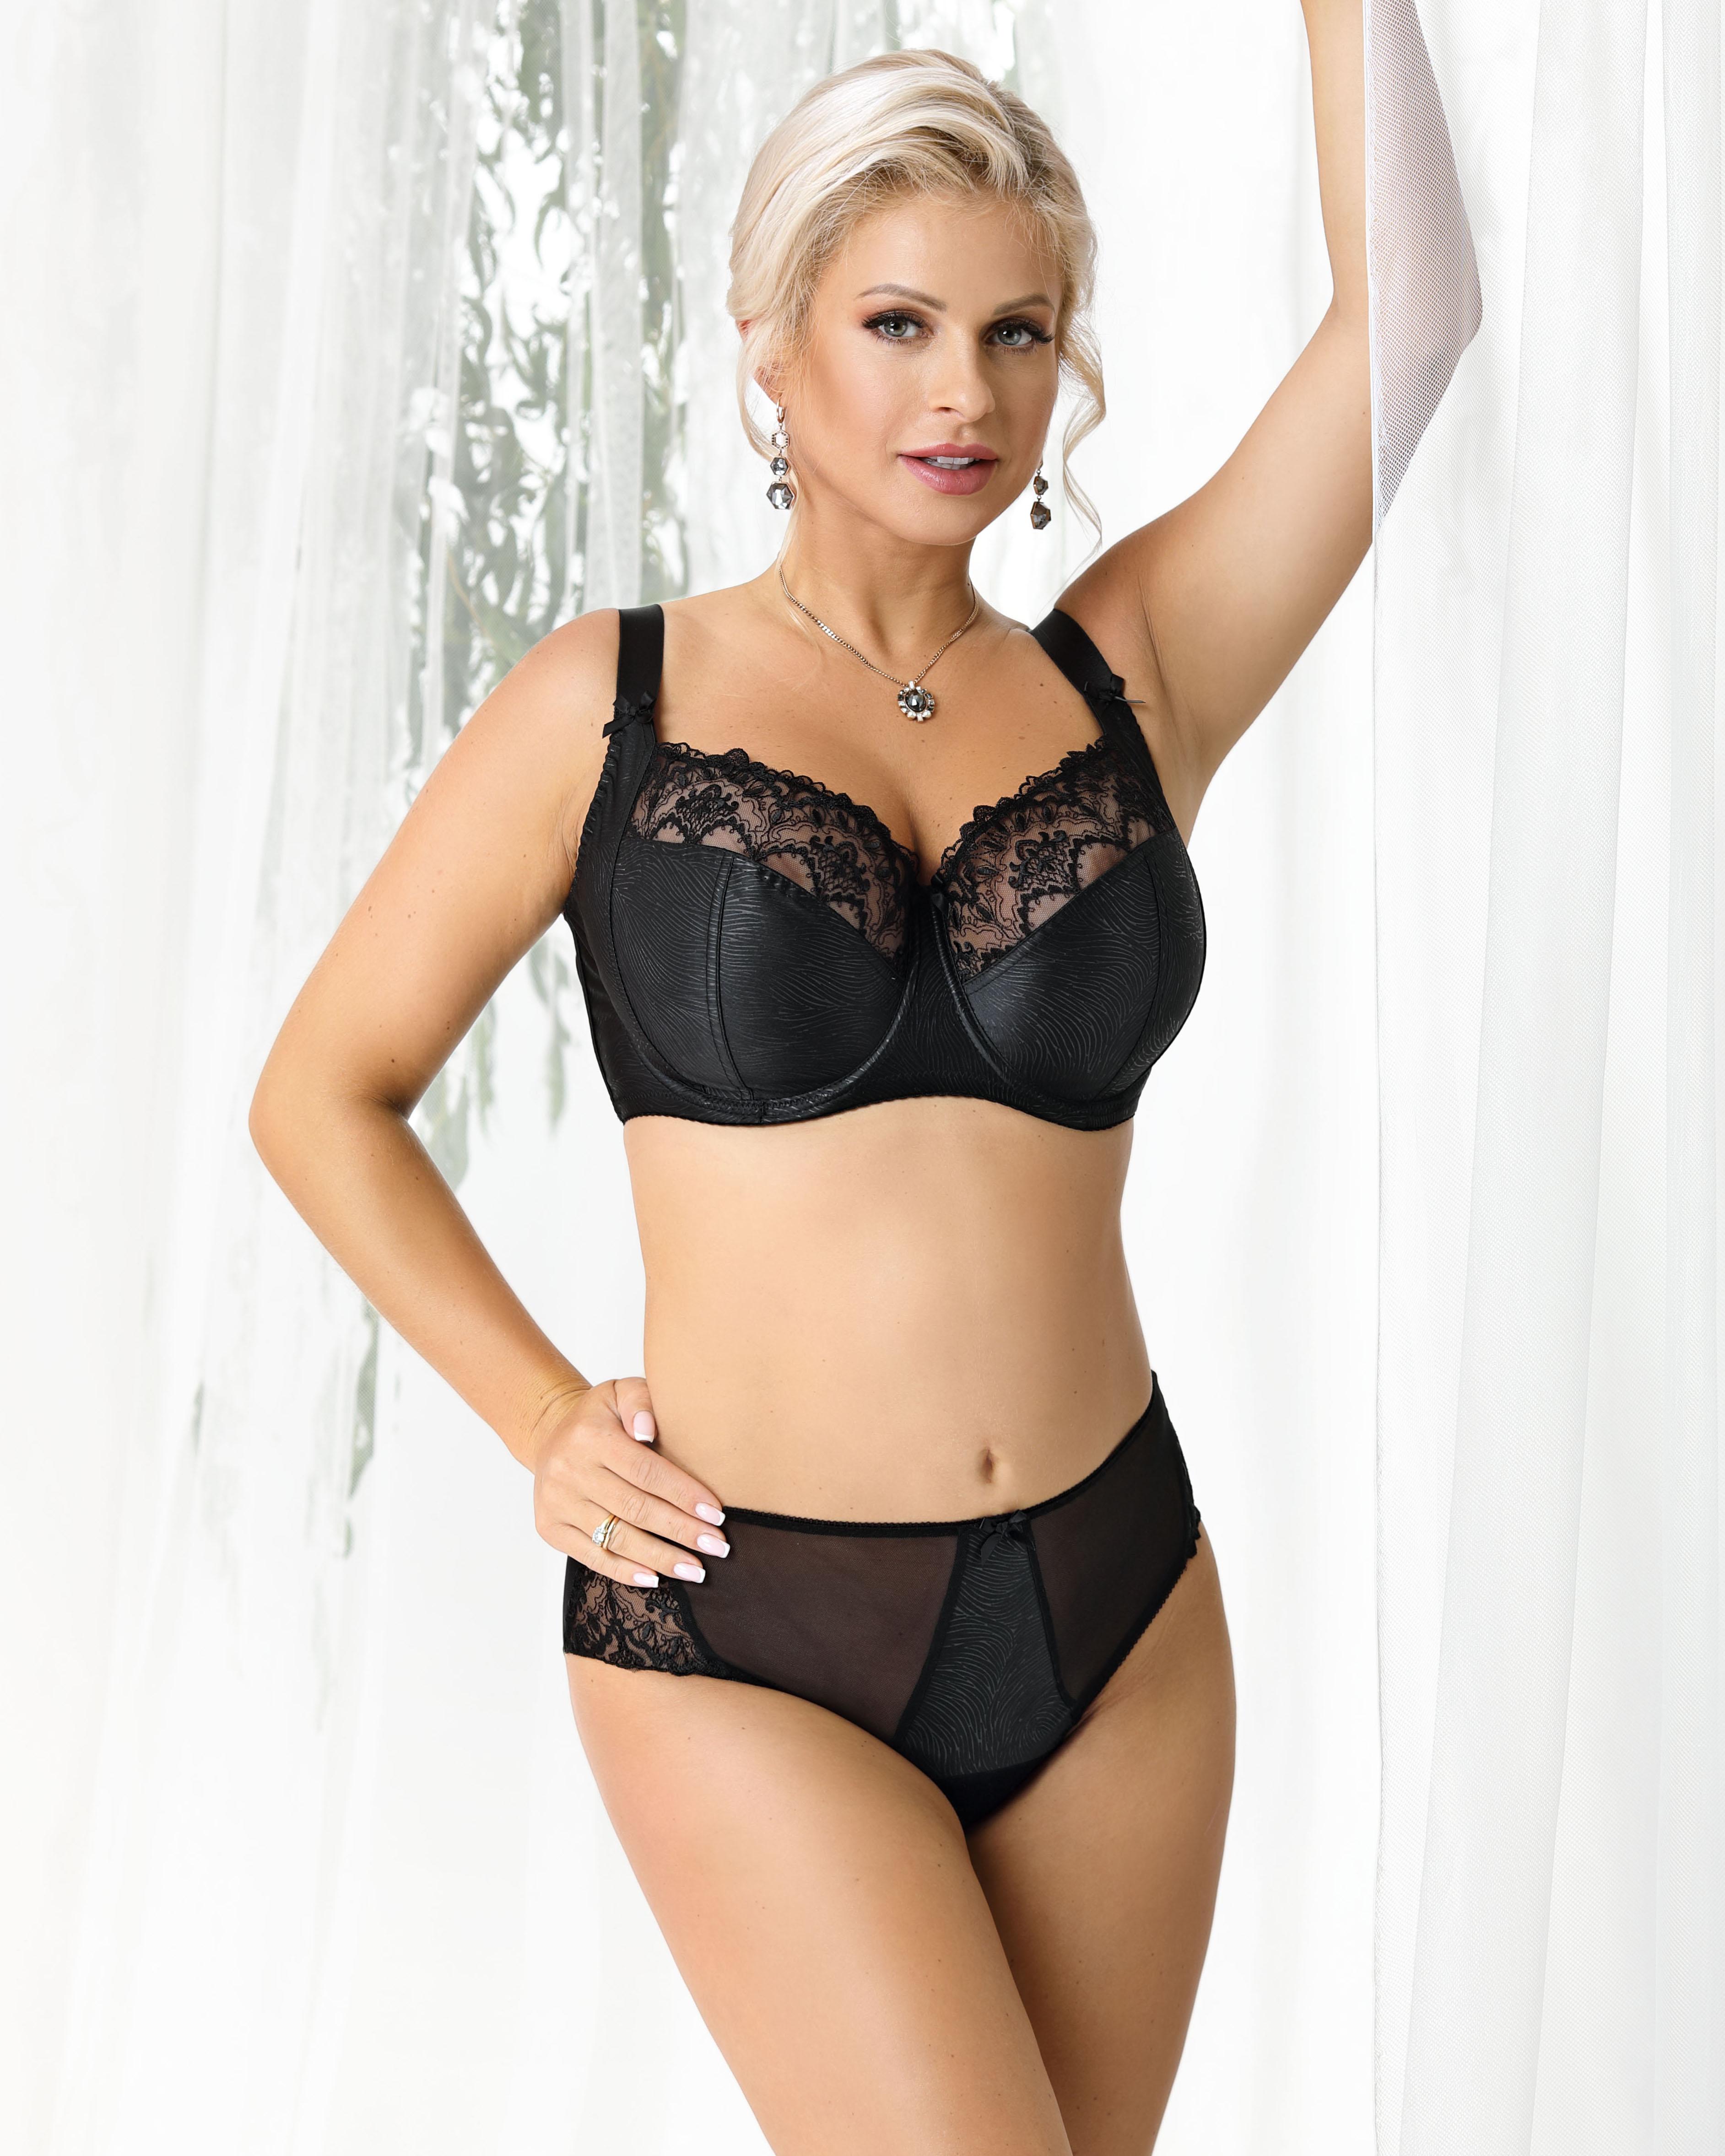 Nessa Clarisse soft Bra (Black) 85G фото